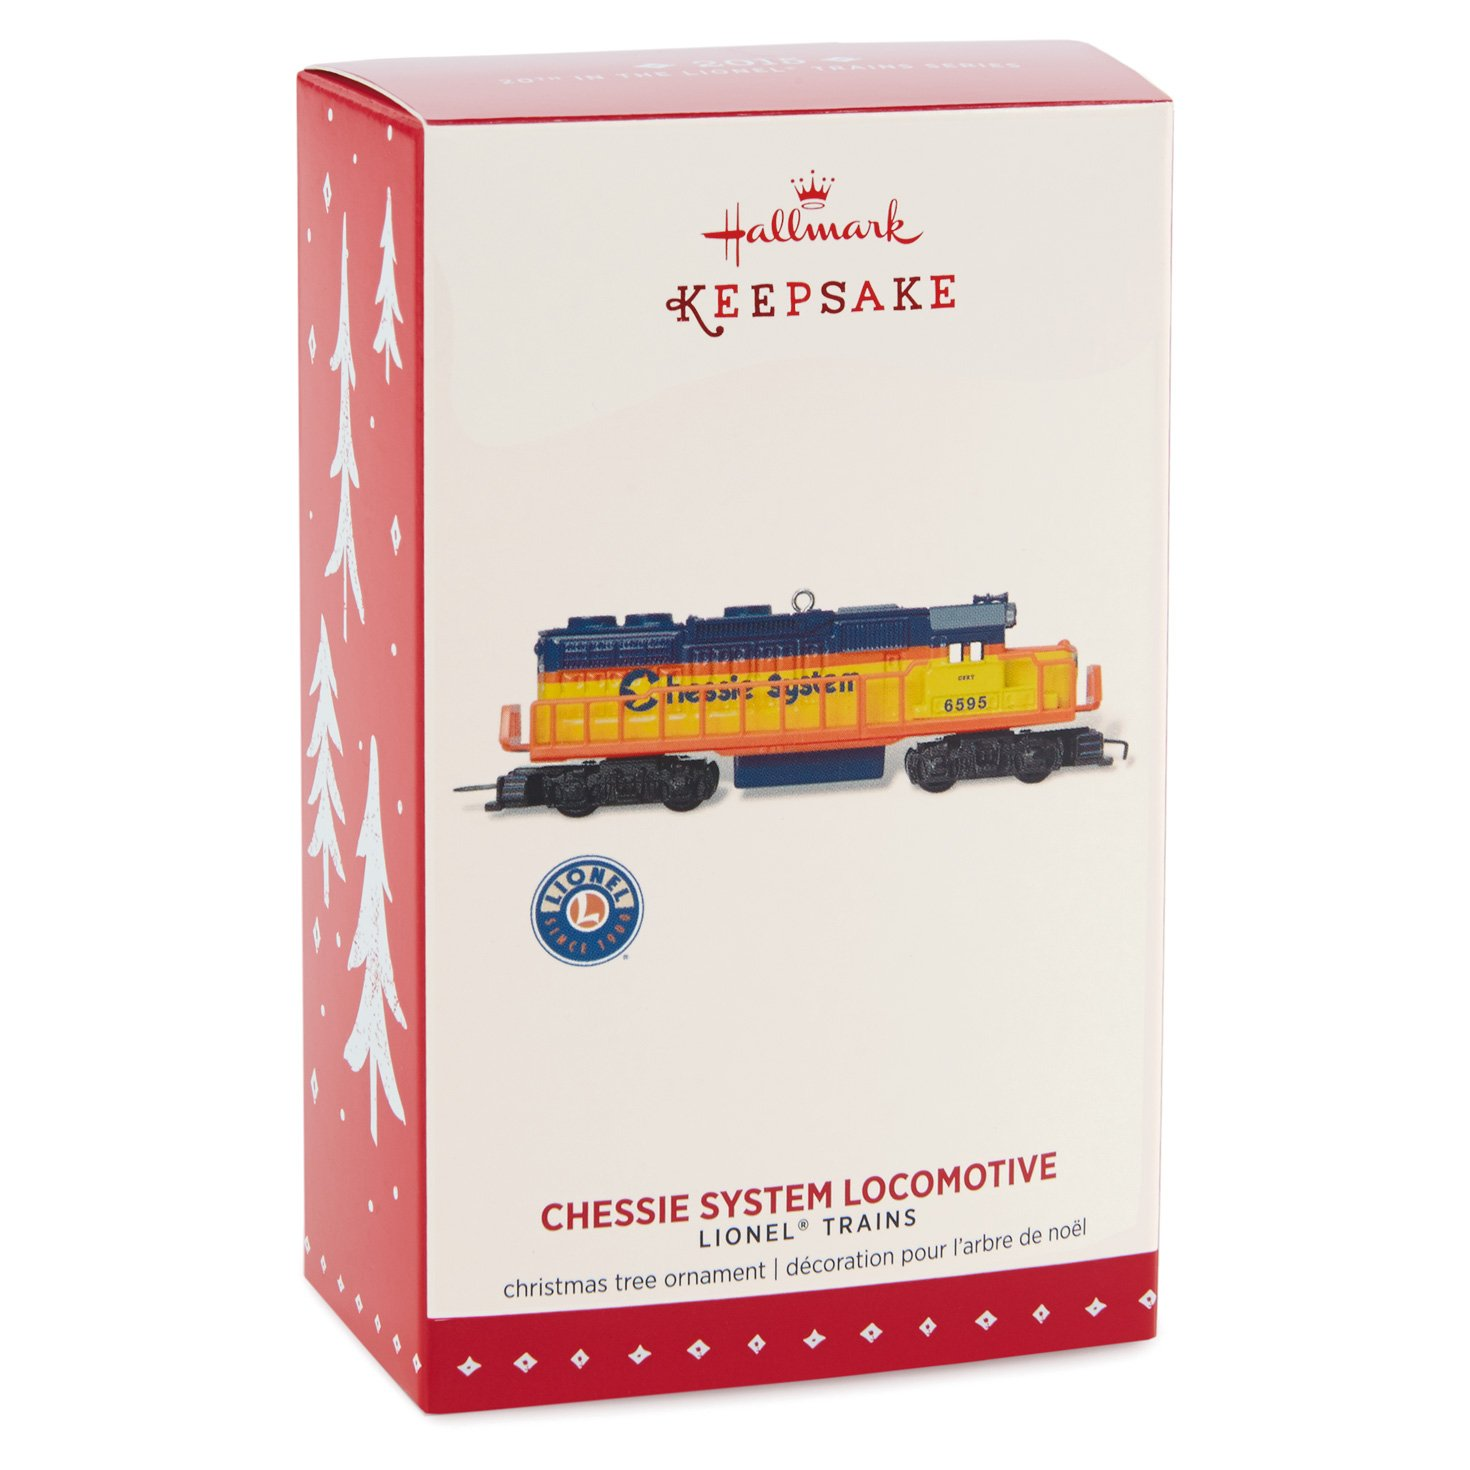 Amazoncom Hallmark Keepsake Ornament Lionel Chessie System Locomotive Train 20Th